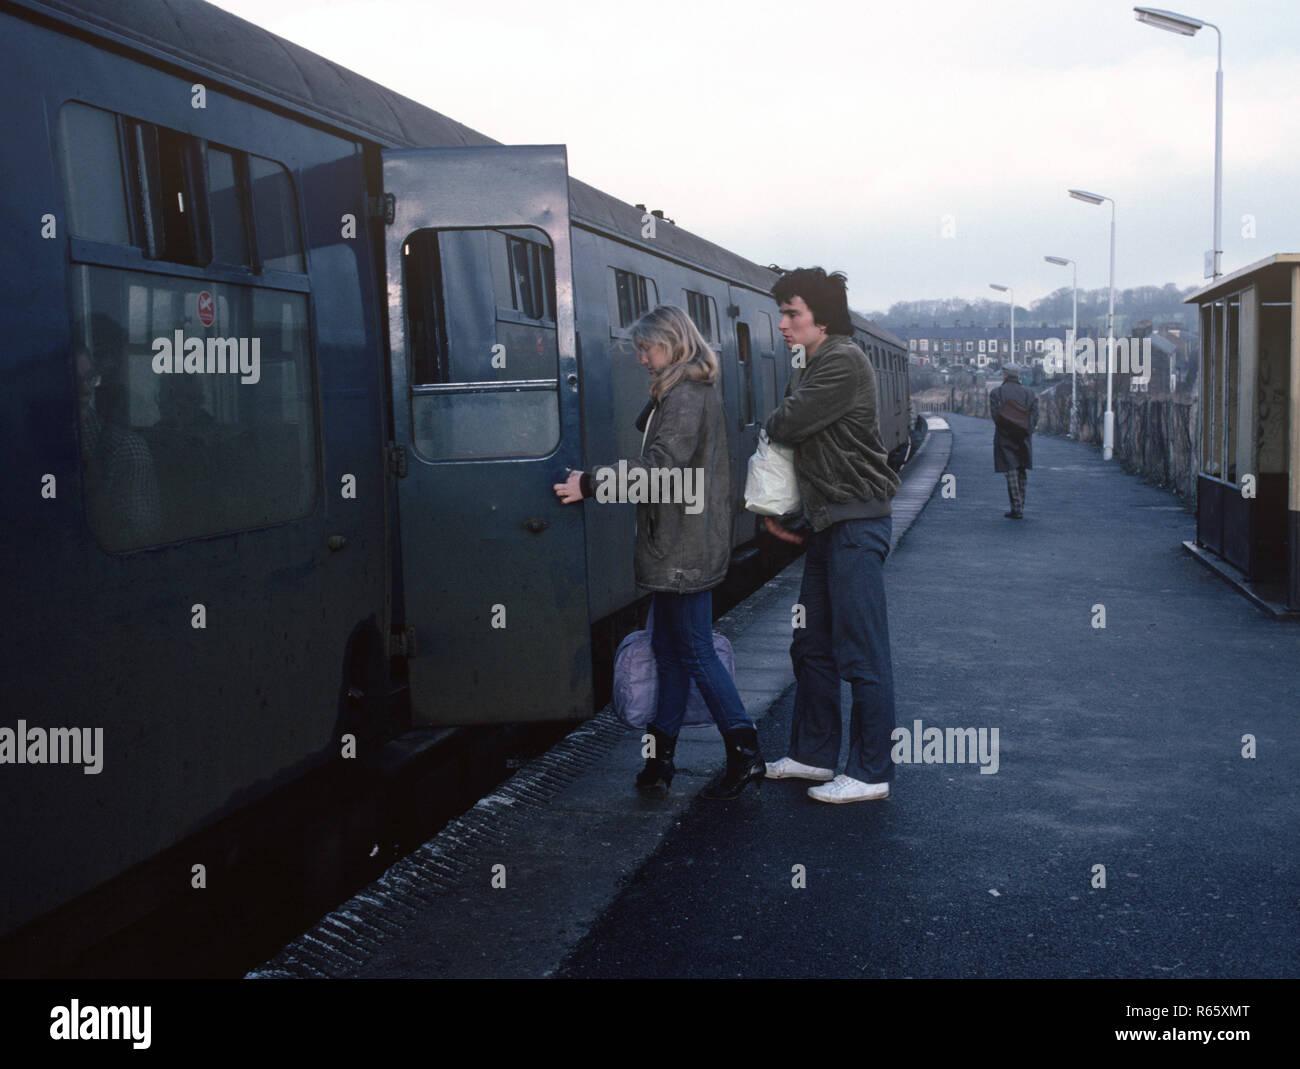 Passengers at Hapton station on the British Rail Preston to Colne railway line, Lancashire, Great Britain - Stock Image